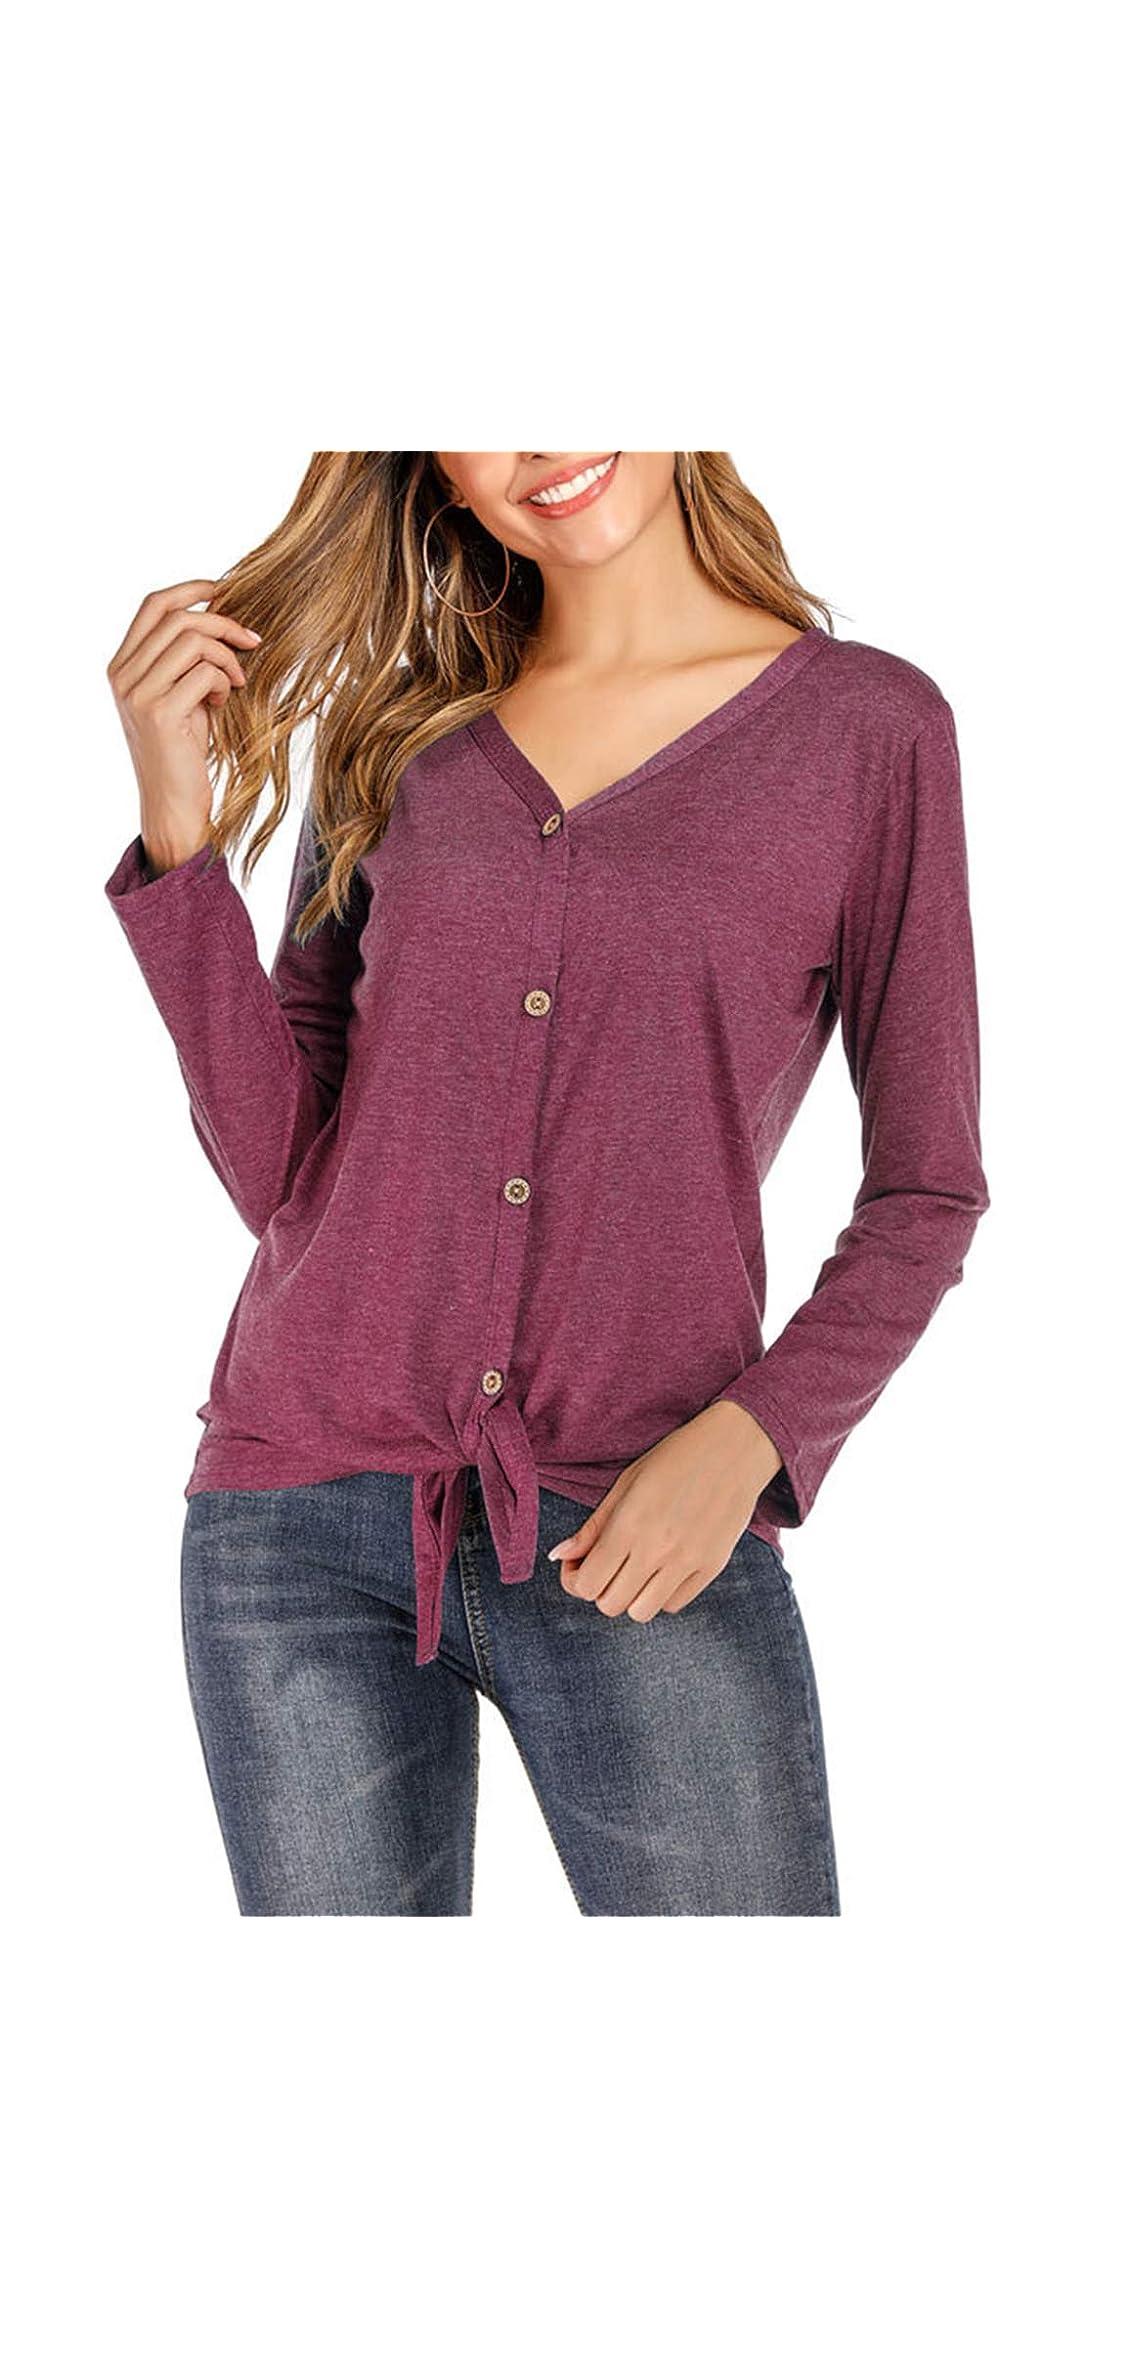 Button Down Shirts For Women - V Neck Ruffle Hem Pullover Long